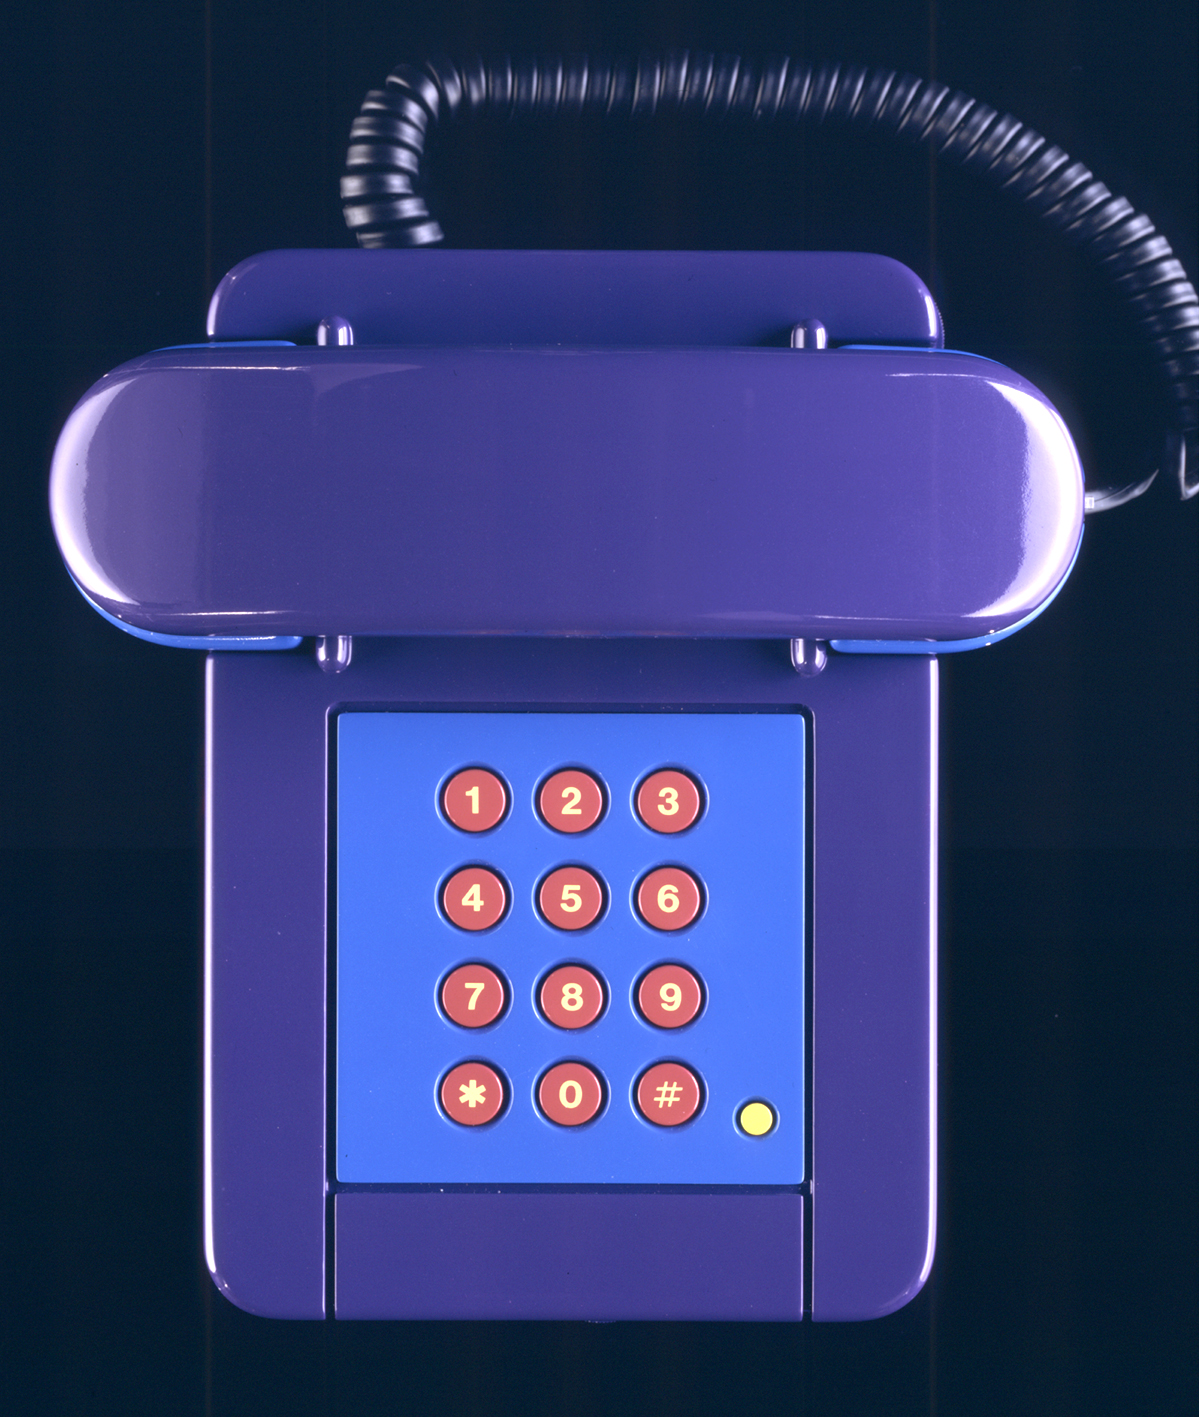 1988_Olivetti_Miram_front_violetBlue.jpg